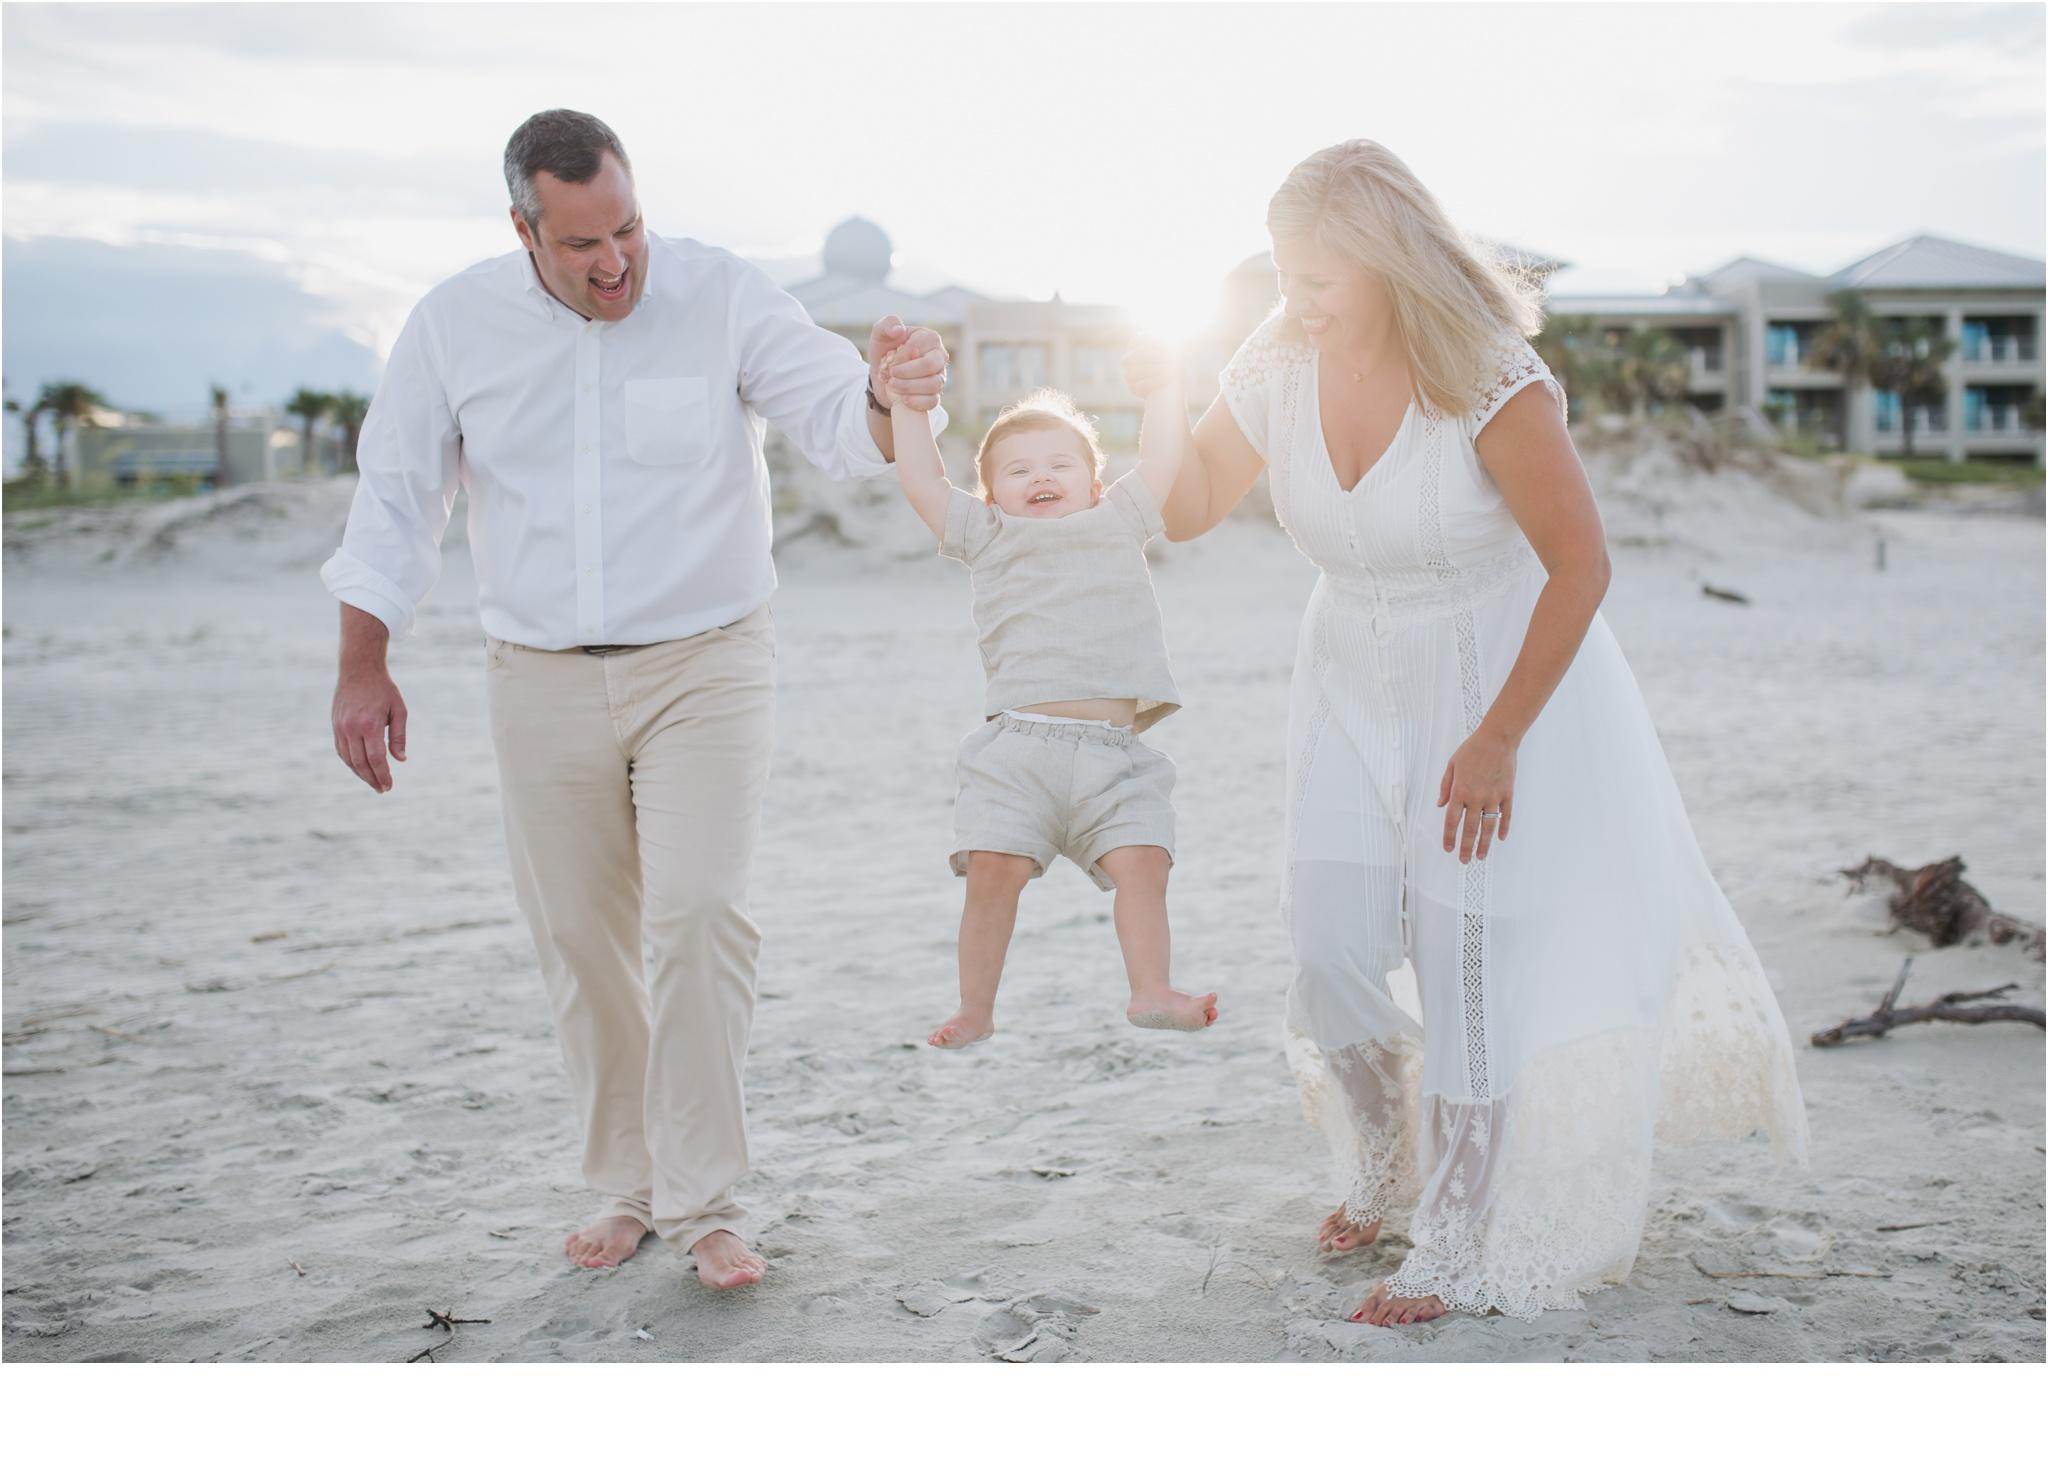 Rainey_Gregg_Photography_St._Simons_Island_Georgia_California_Wedding_Portrait_Photography_1028.jpg